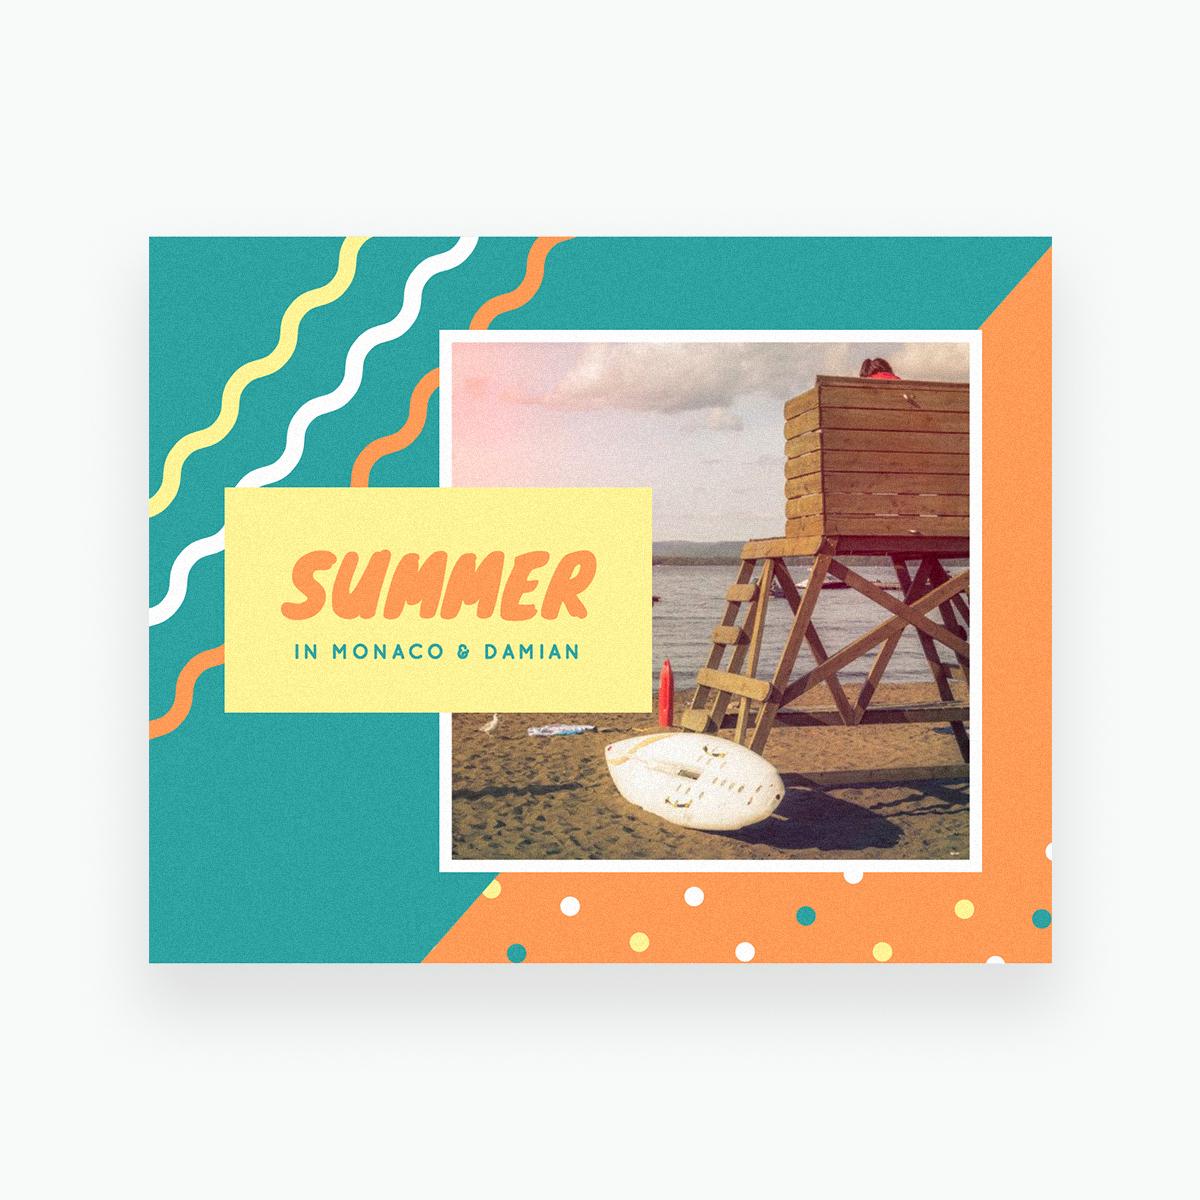 Free Online Scrapbook Maker: Design A Custom Scrapbook - Canva - Free Printable Scrapbook Pages Online